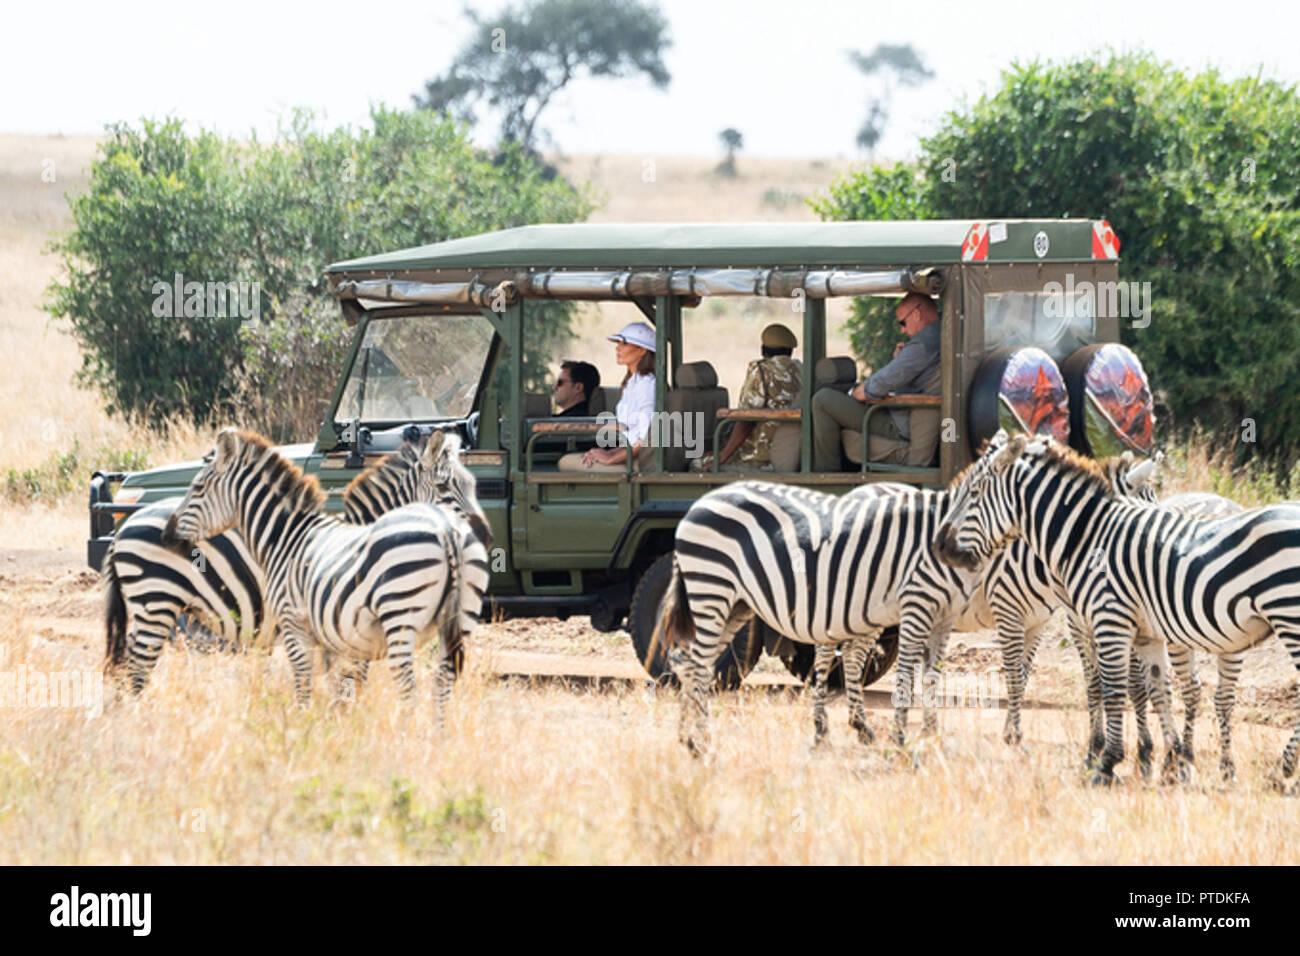 853d894e654 First Lady Melania Trump participates in a safari tour with Nelly Palmeris